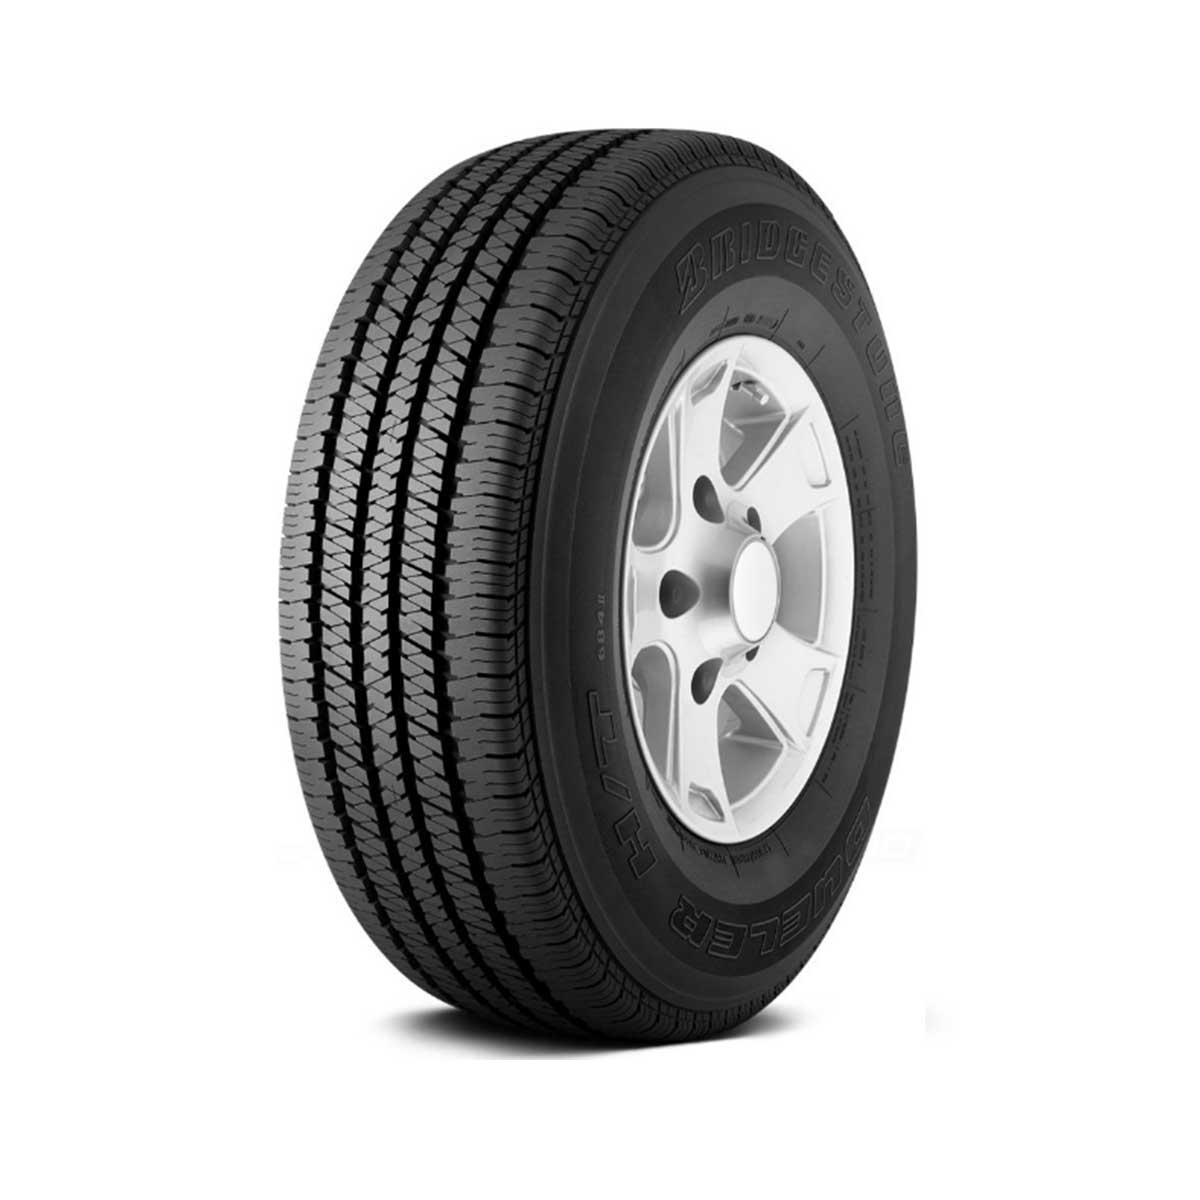 Bridgestone, DUELER H/T 684 II Sommer 64911